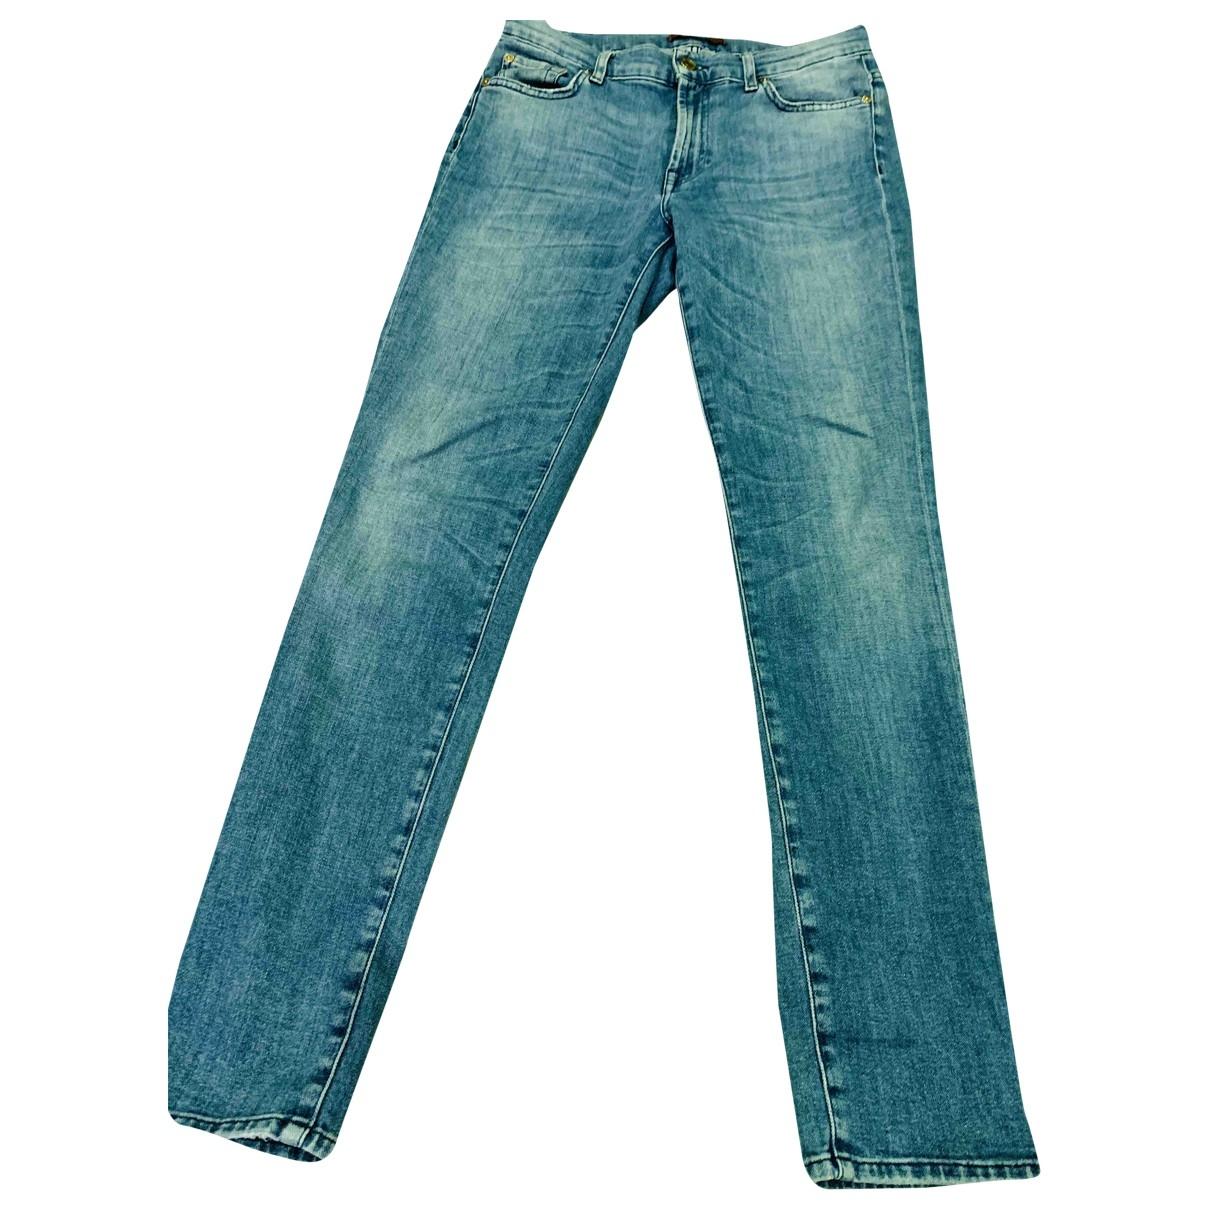 7 For All Mankind \N Blue Denim - Jeans Jeans for Women 36 FR